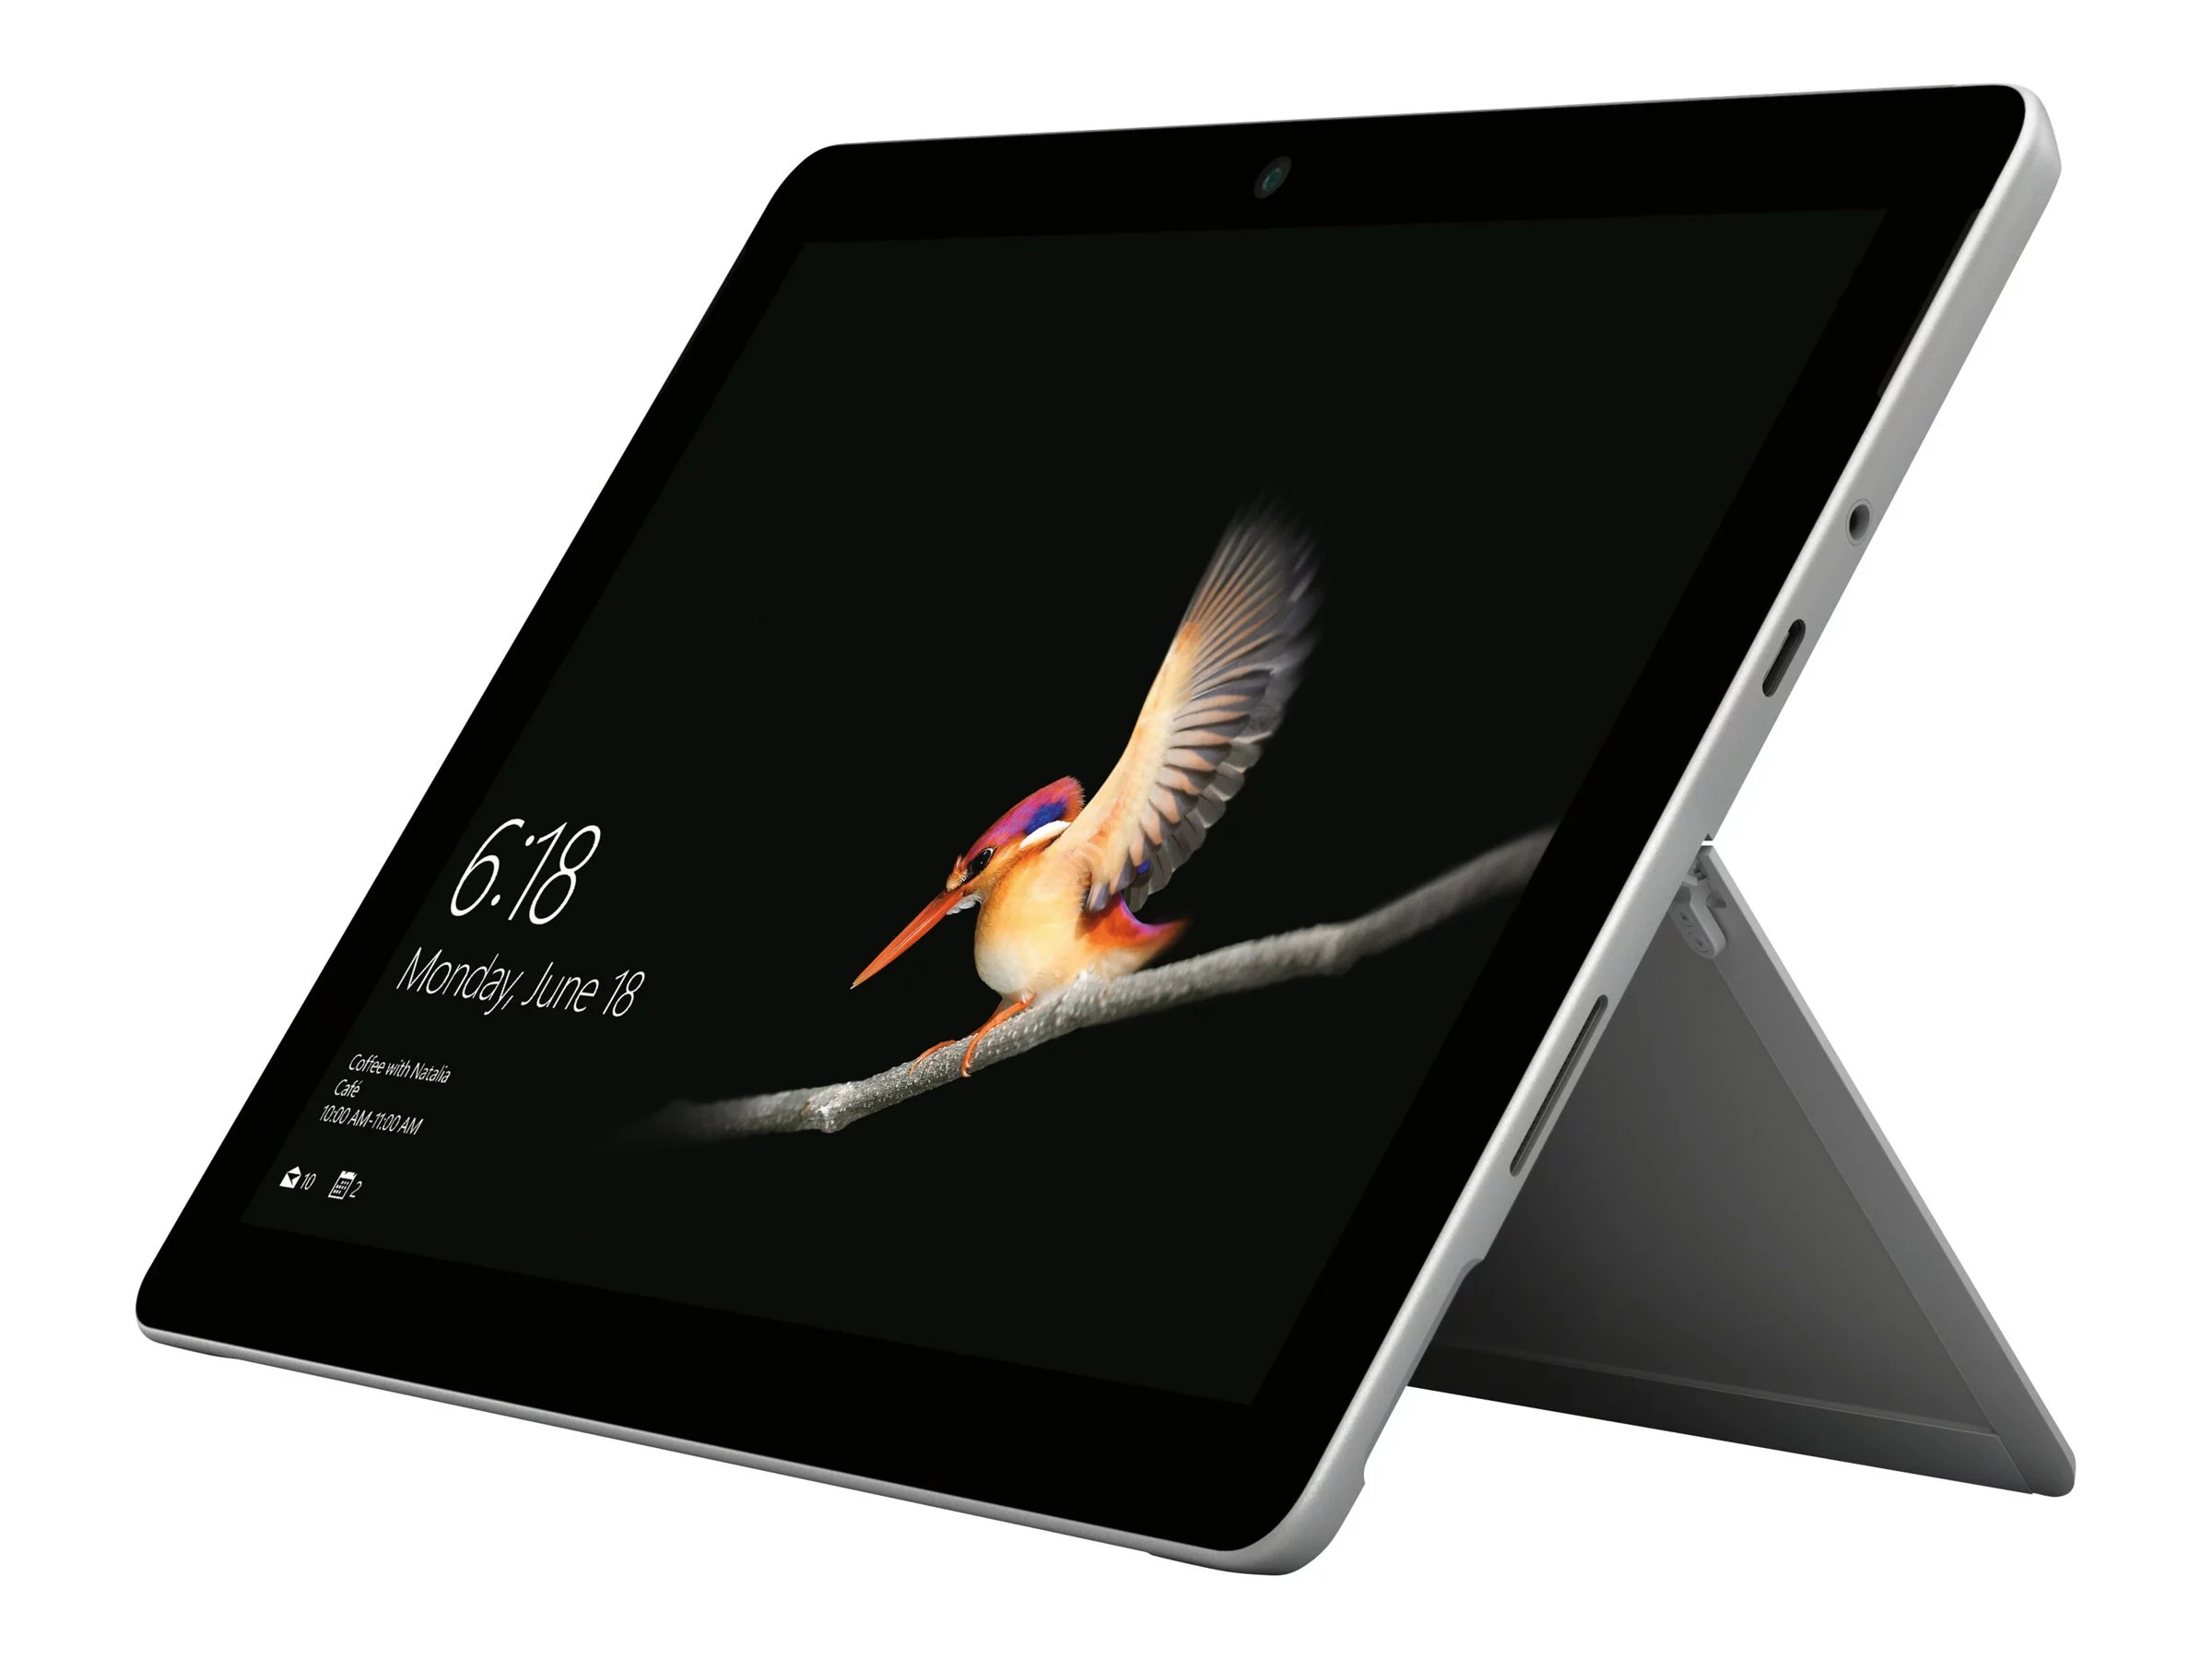 New Microsoft Surface Go (Intel Pentium Gold, 4GB RAM, 128GB)